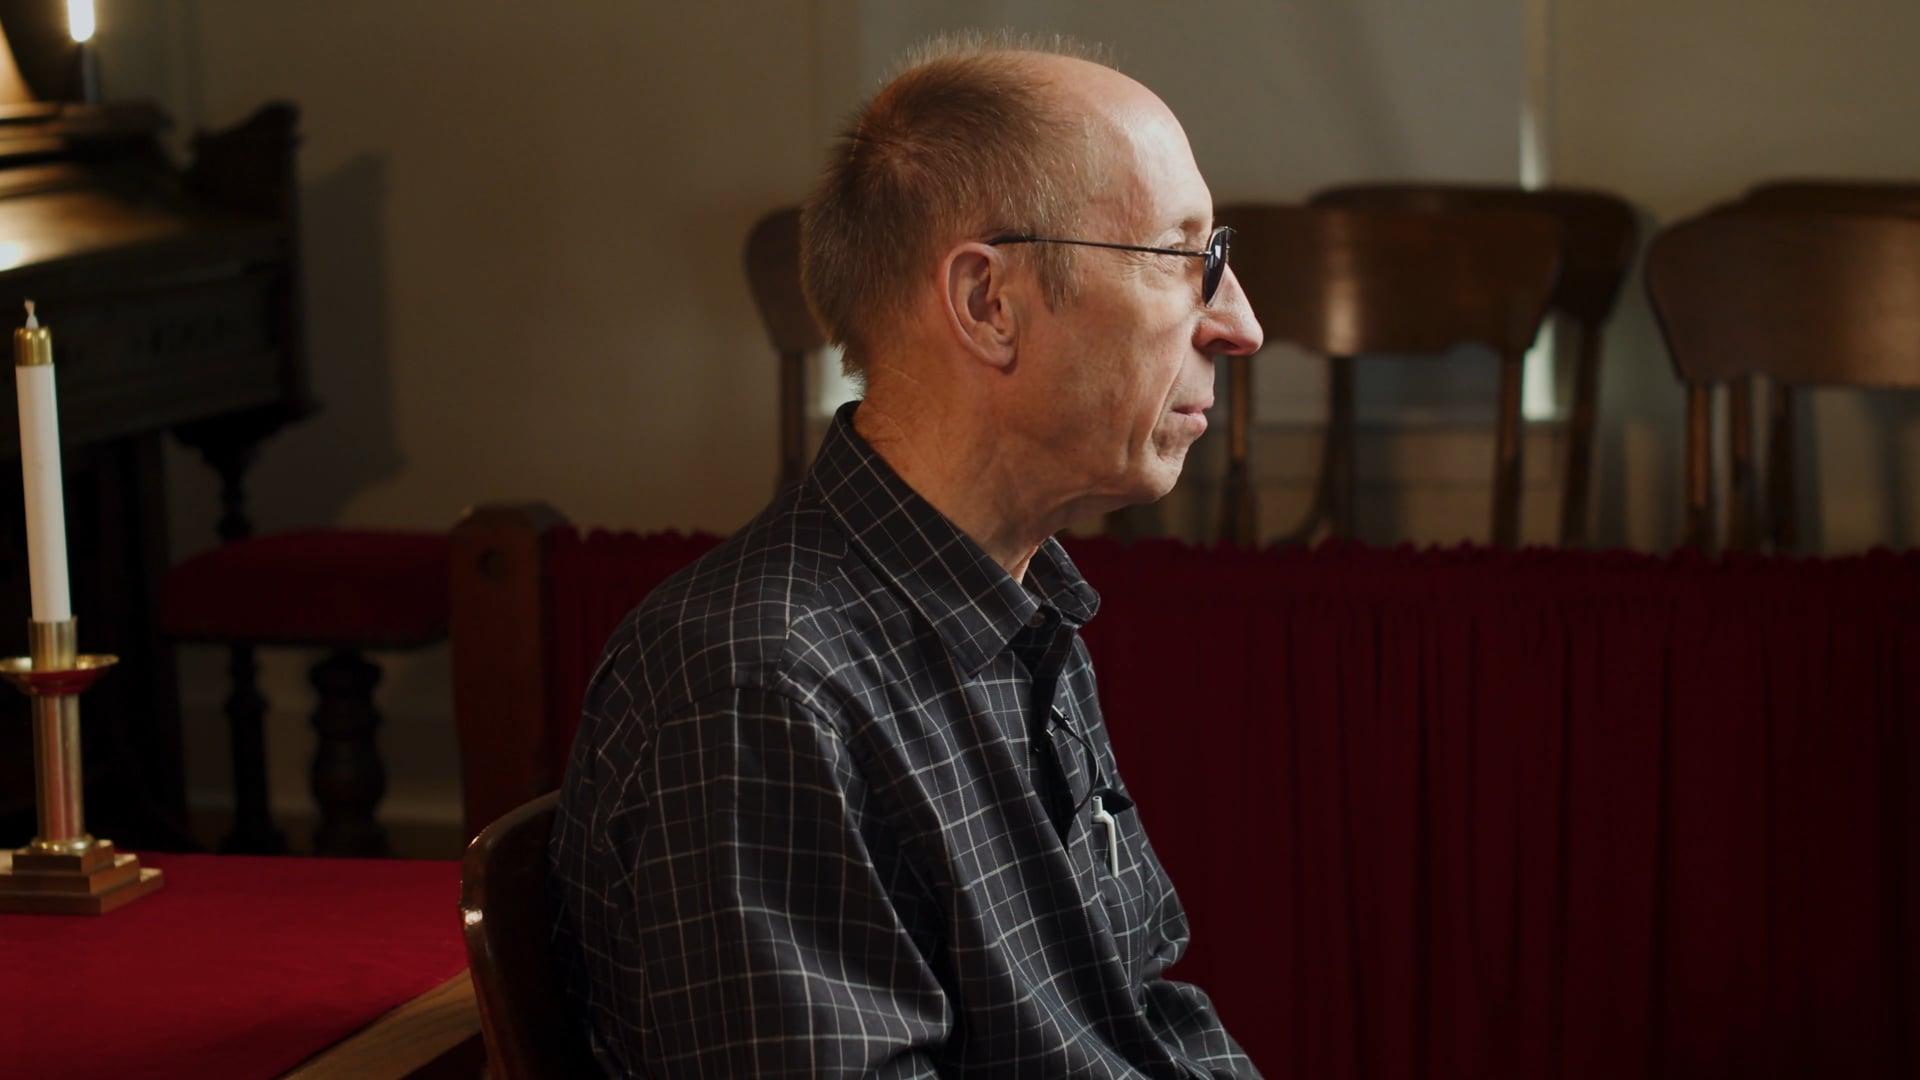 Wayne Godfrey's Testimony